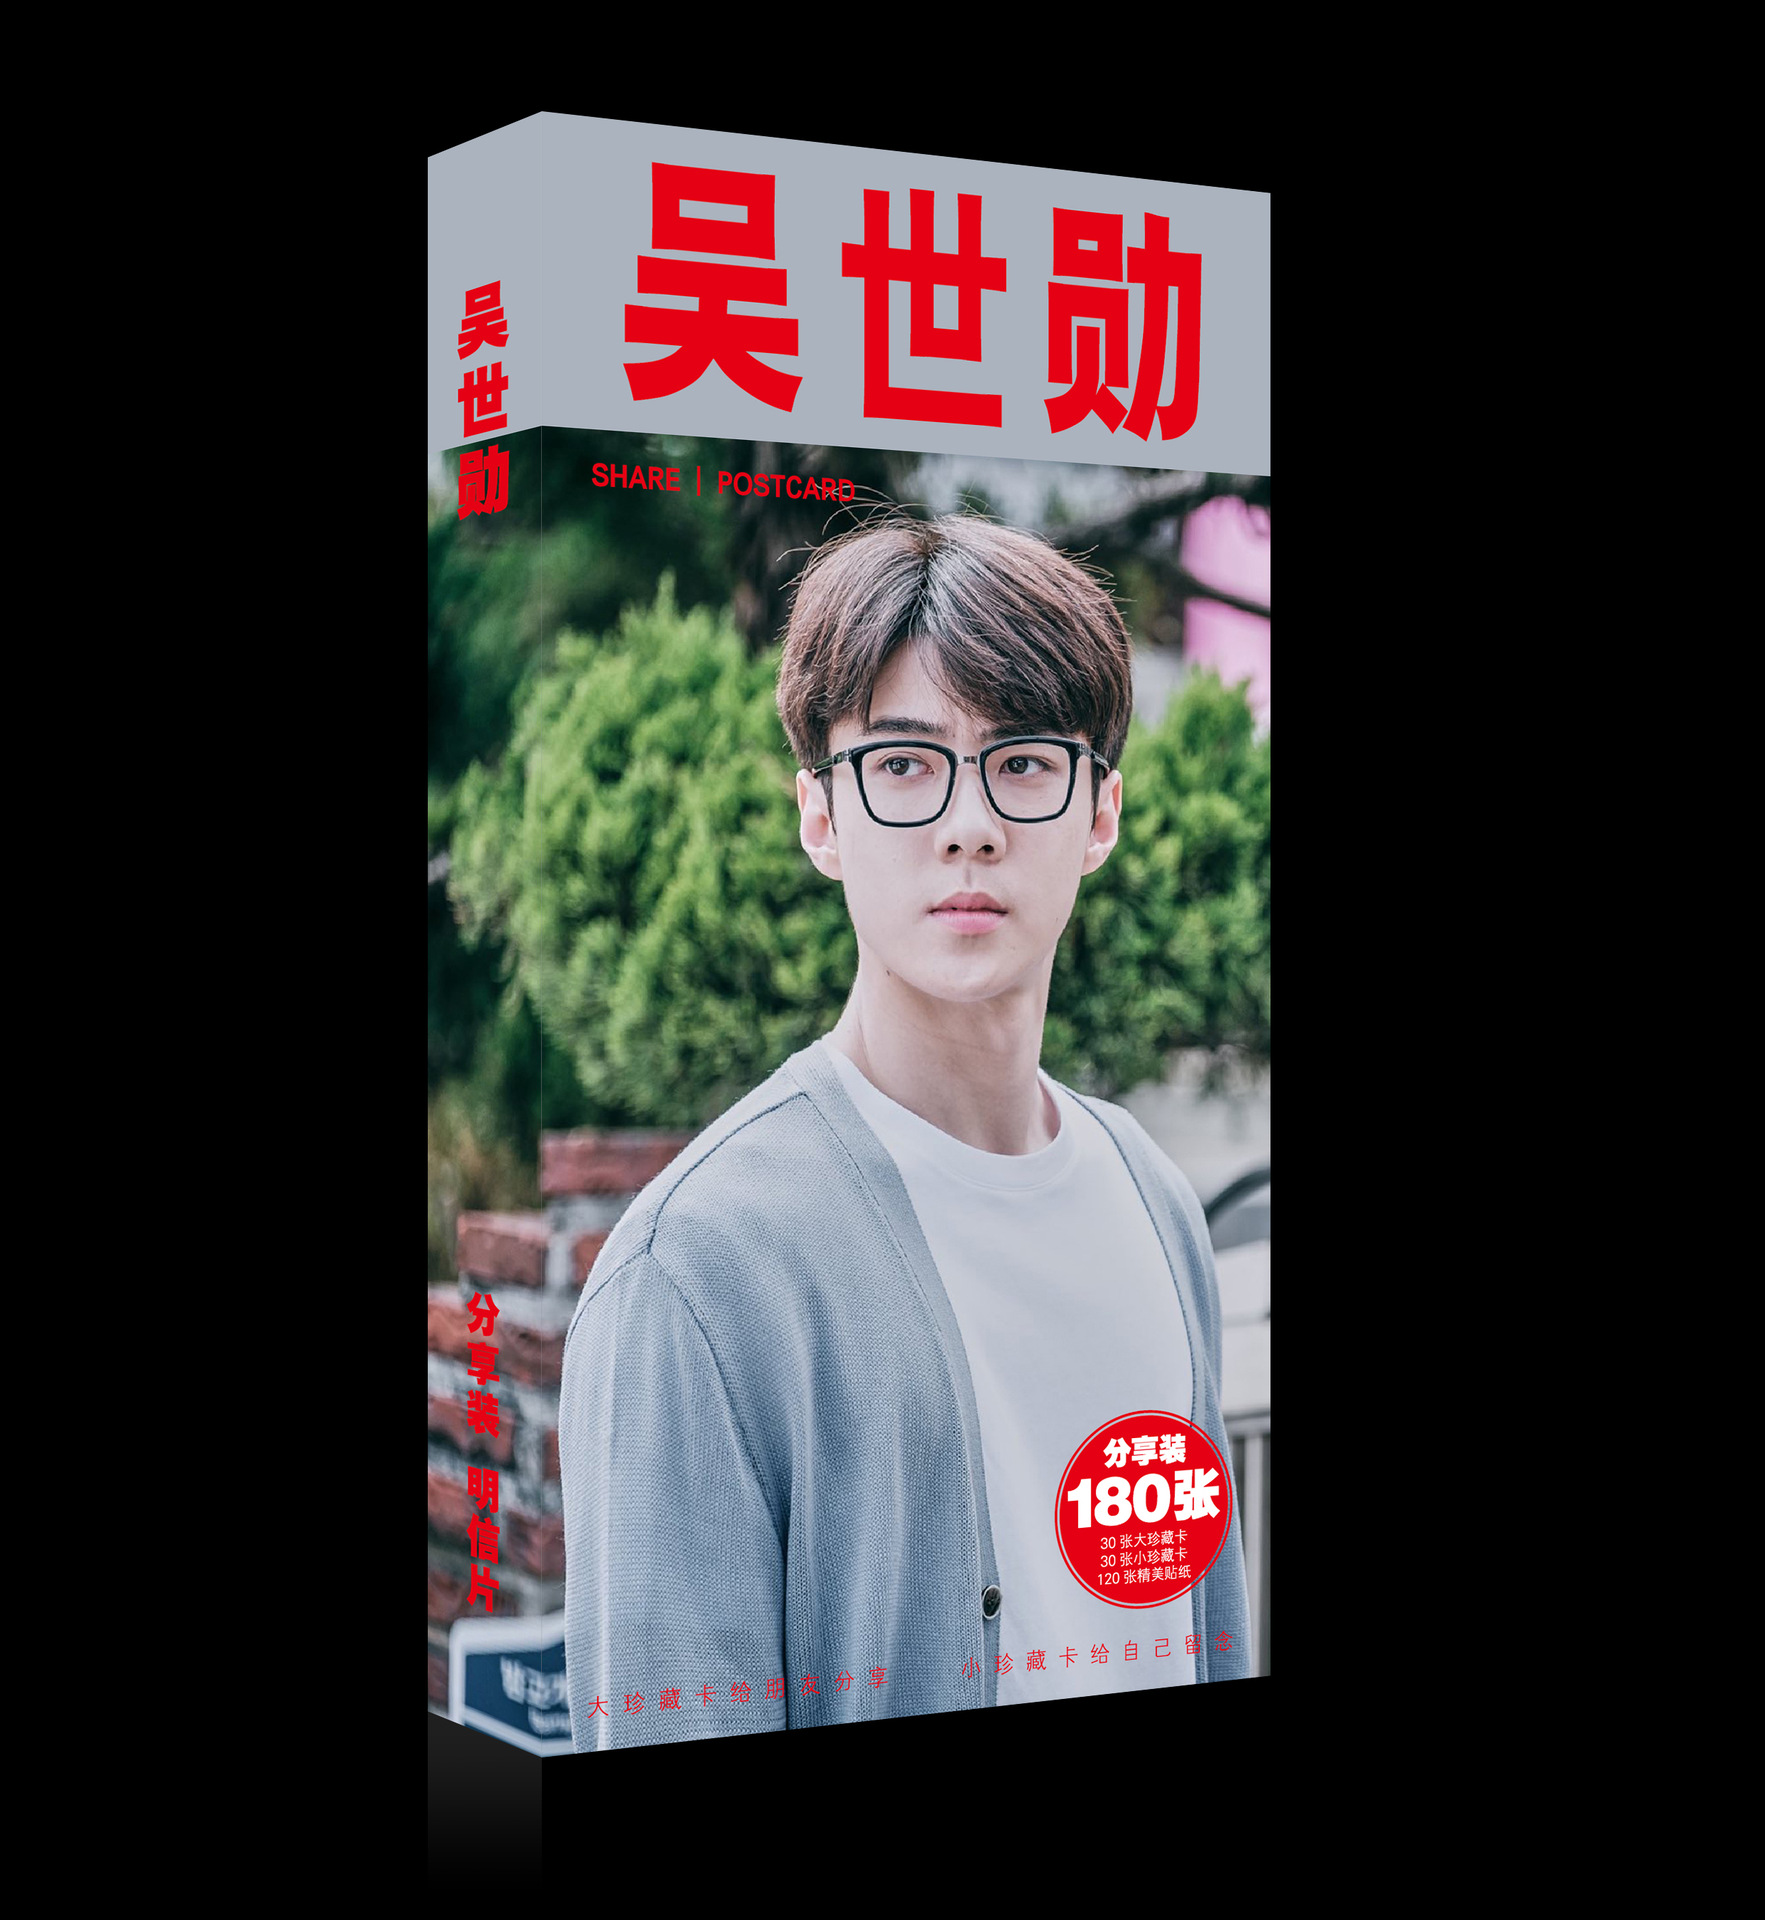 Costume Props Kpop Got7 Jackson Wang Fanart Postcard Post Cards Sticker Artbook Gift Cosplay Props Book Set Collection